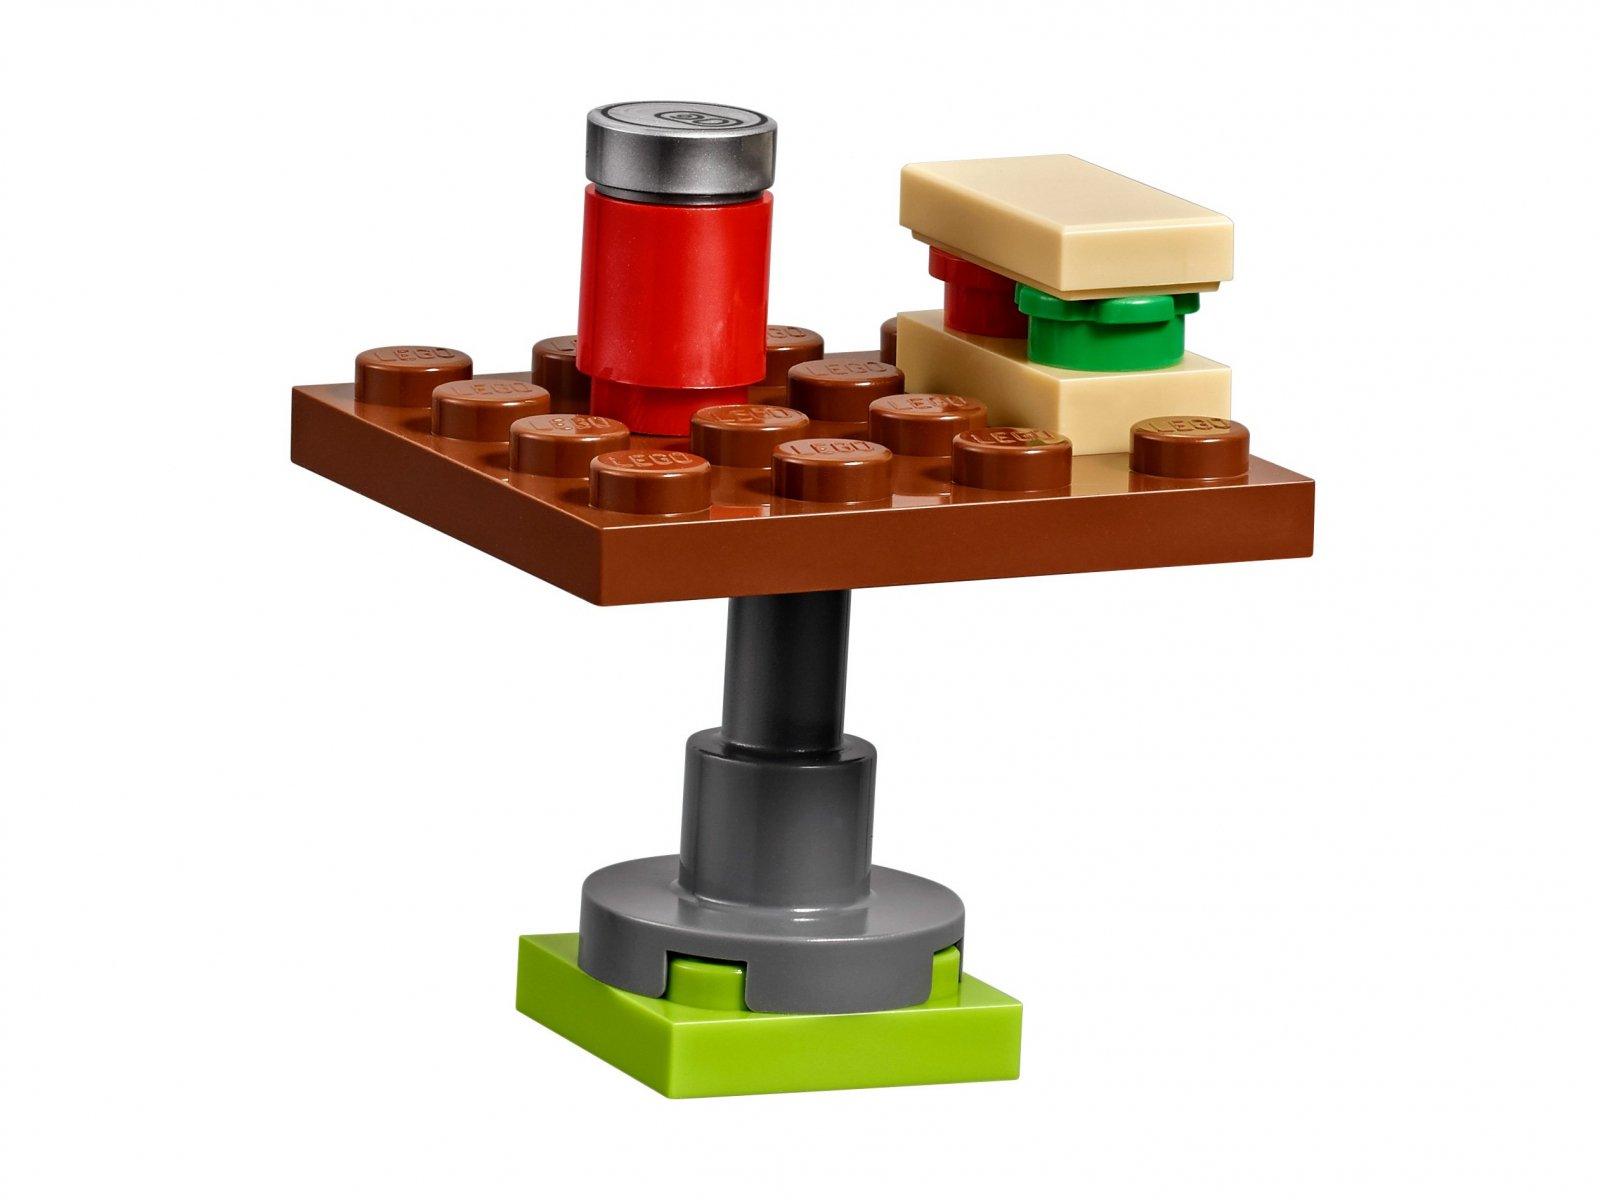 LEGO Friends Lot samolotem nad Miastem Heartlake 41343